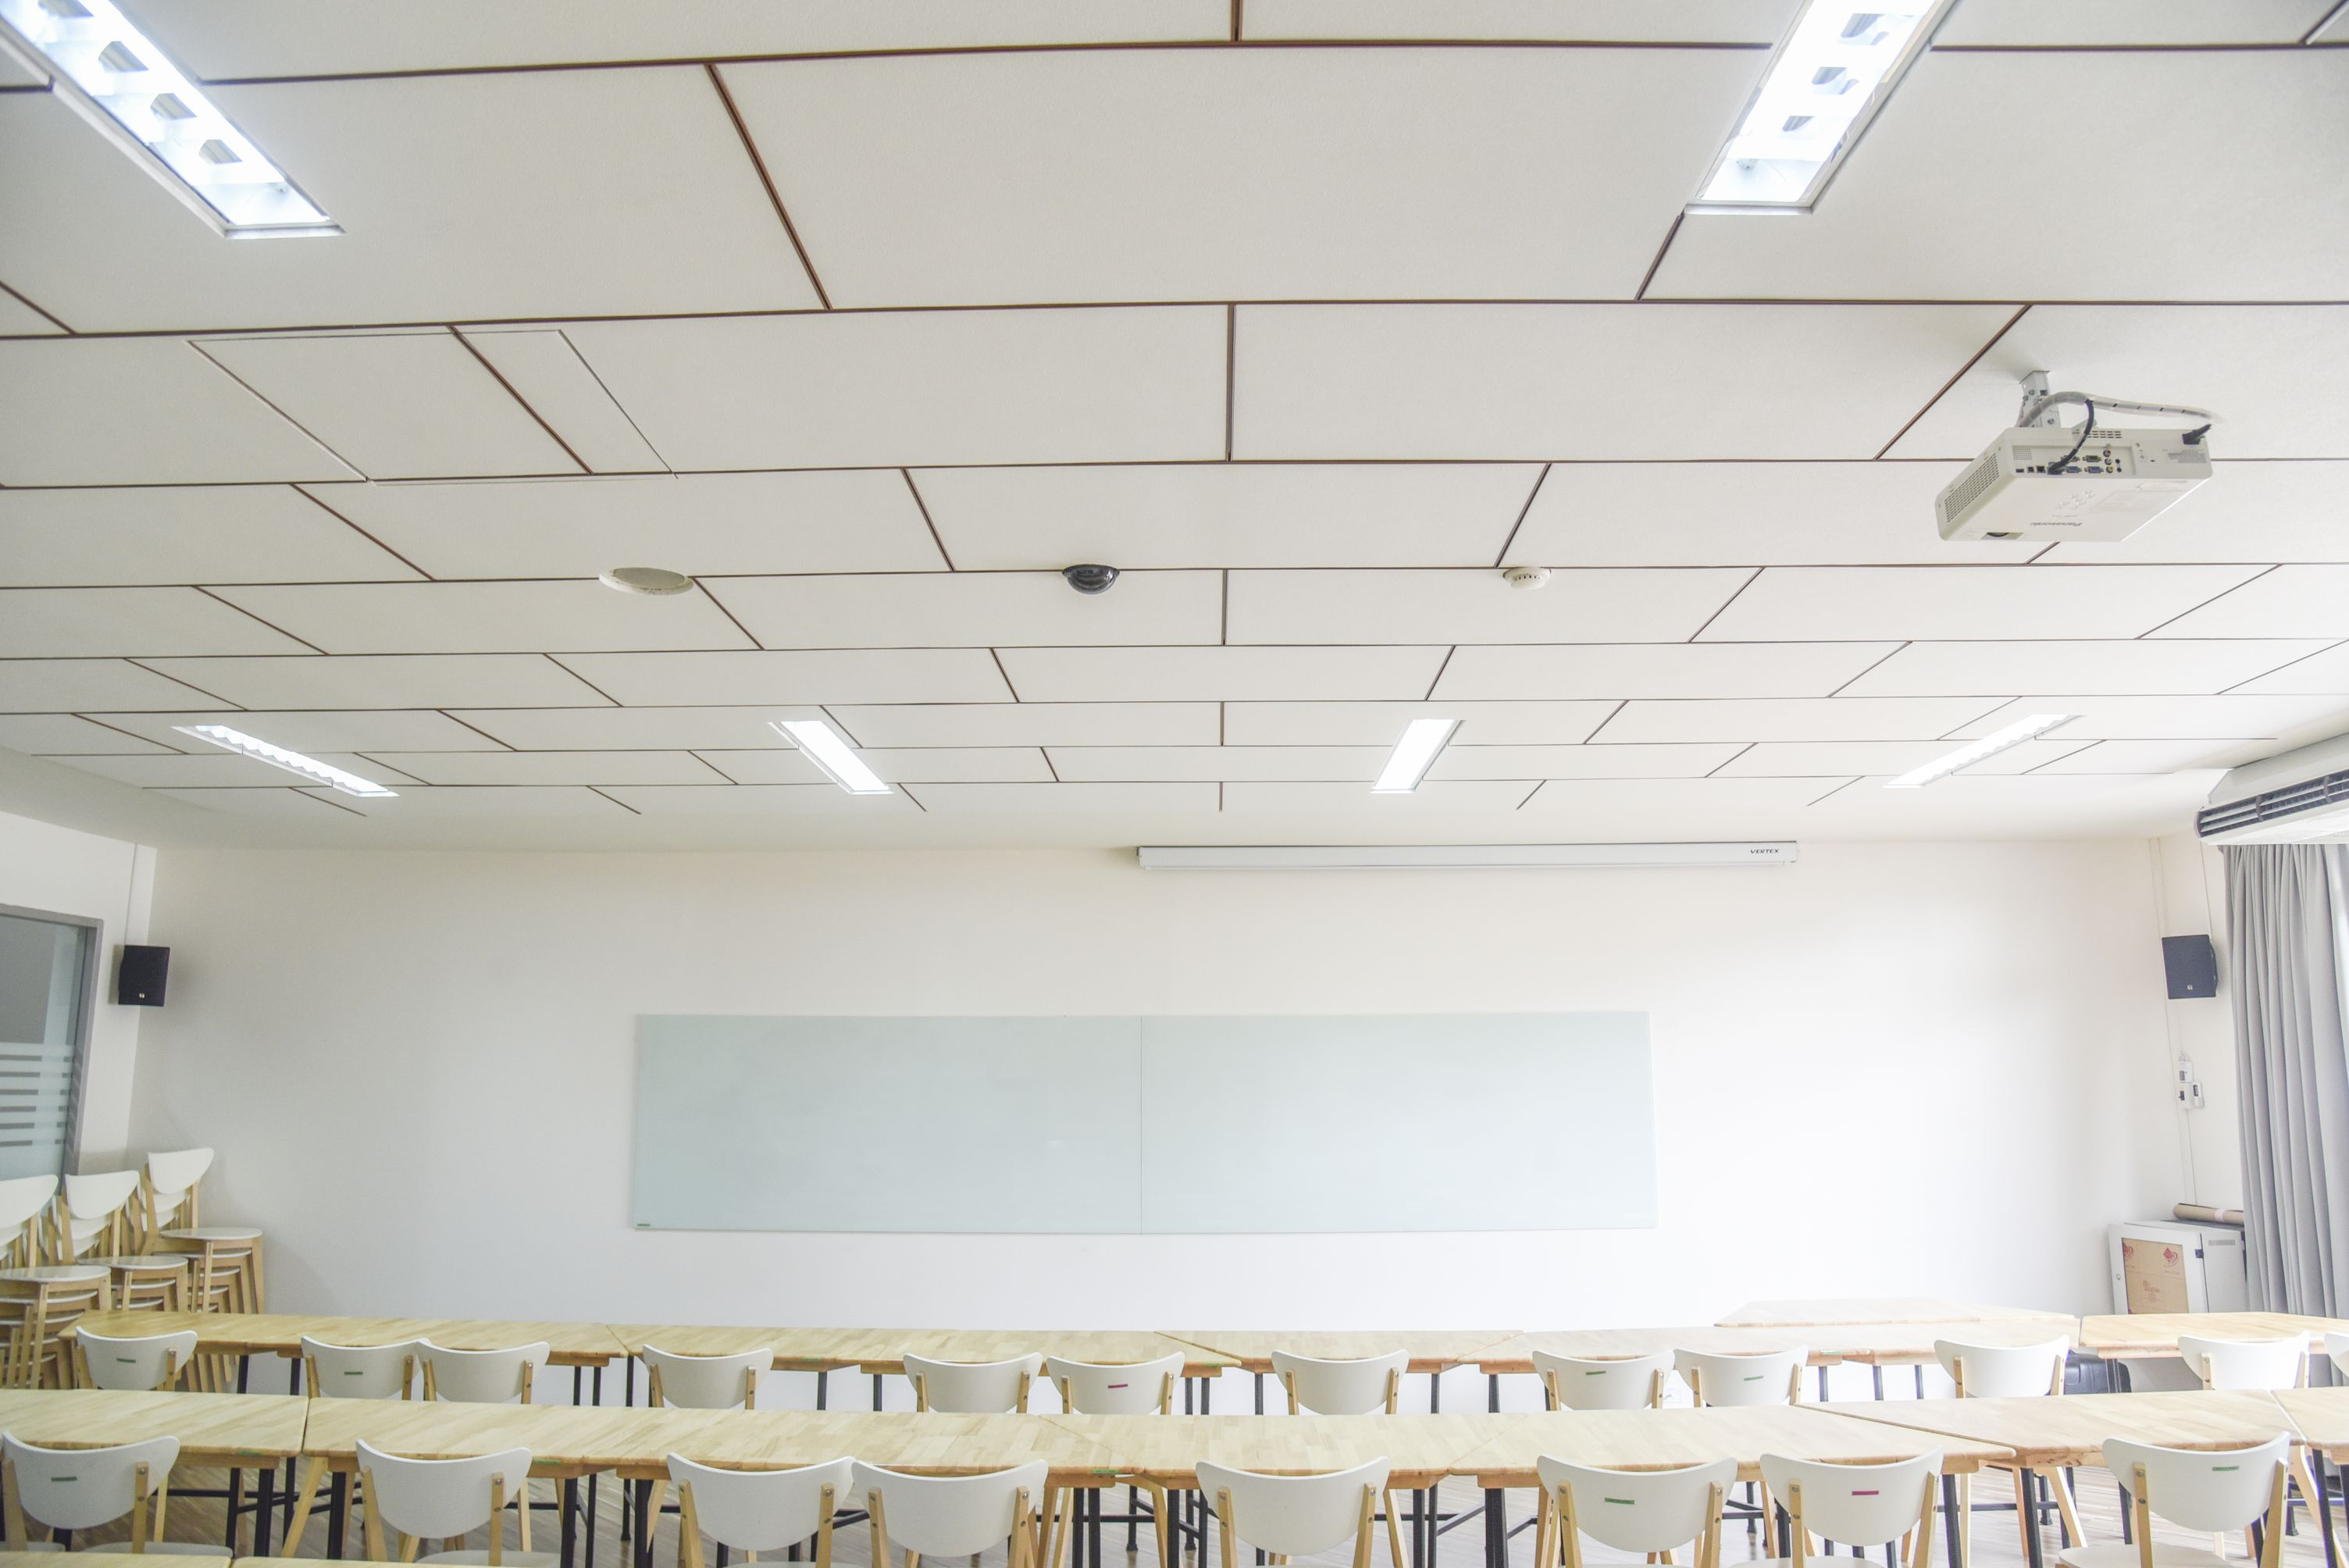 insulation board SCG Acoustic Ceiling Wondery (12)